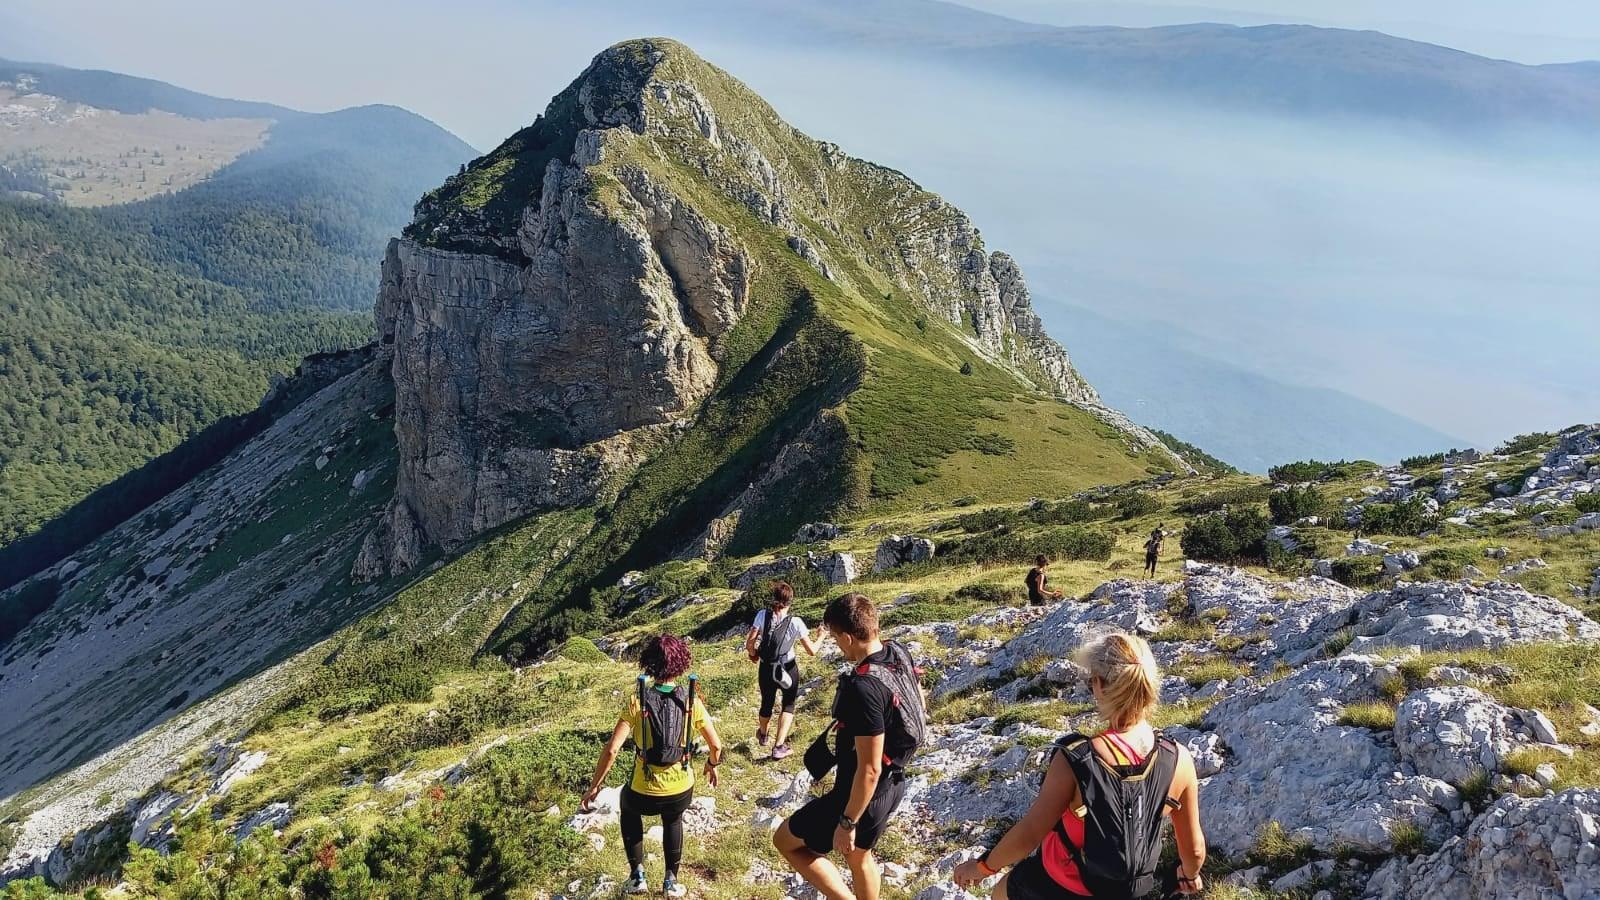 Trenutno pregledavate Troglav (1913m) – najviši vrh Dinare